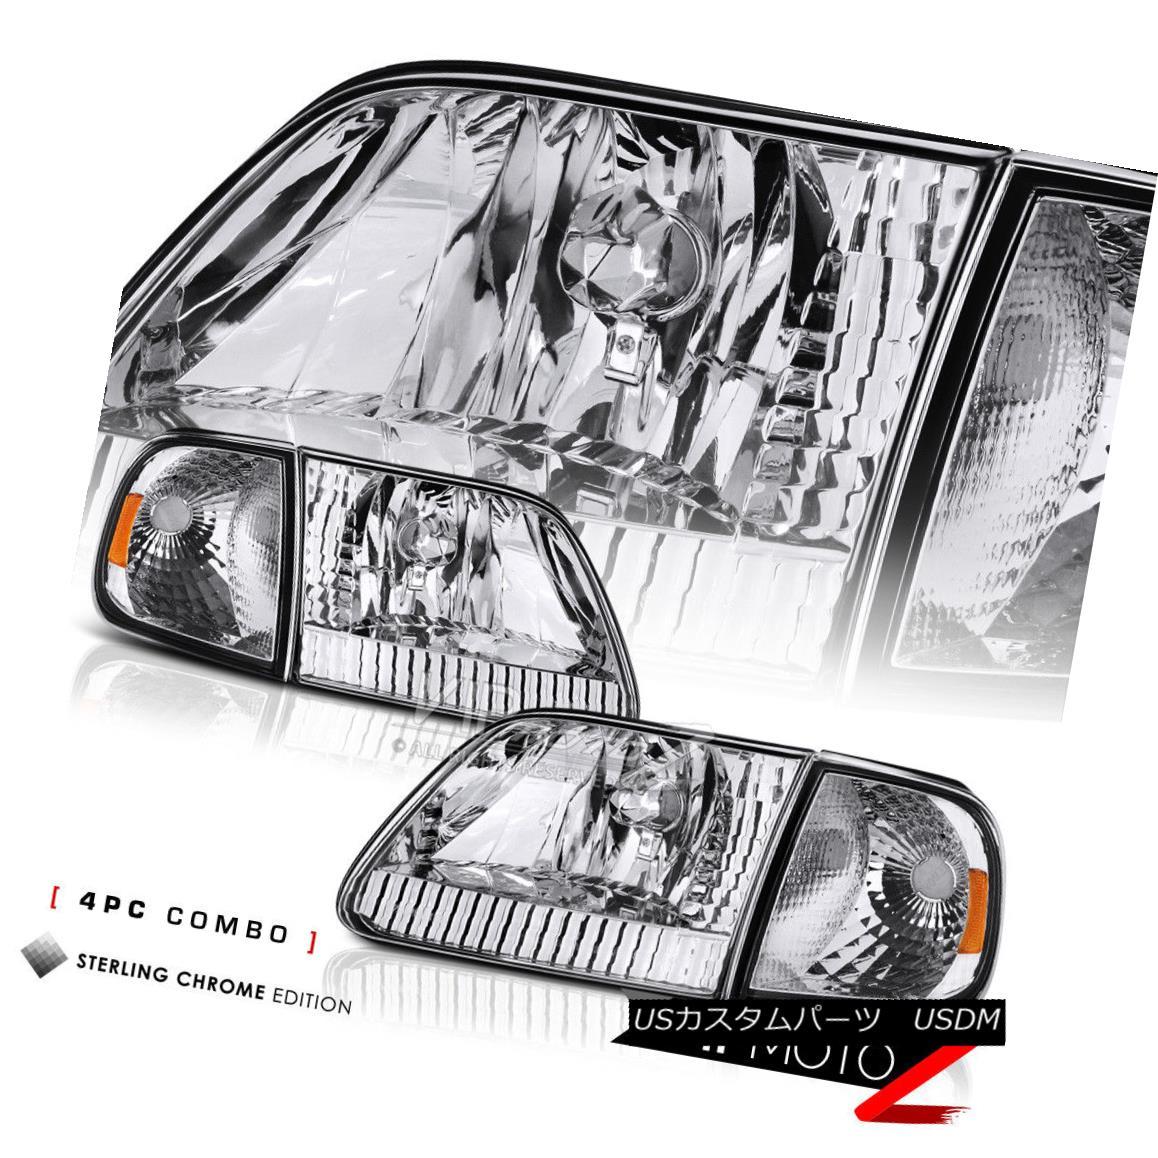 1997-2003 Ford F150 Black Corner Signal Front Head Lights Lamp PAIR 4PC COMBO